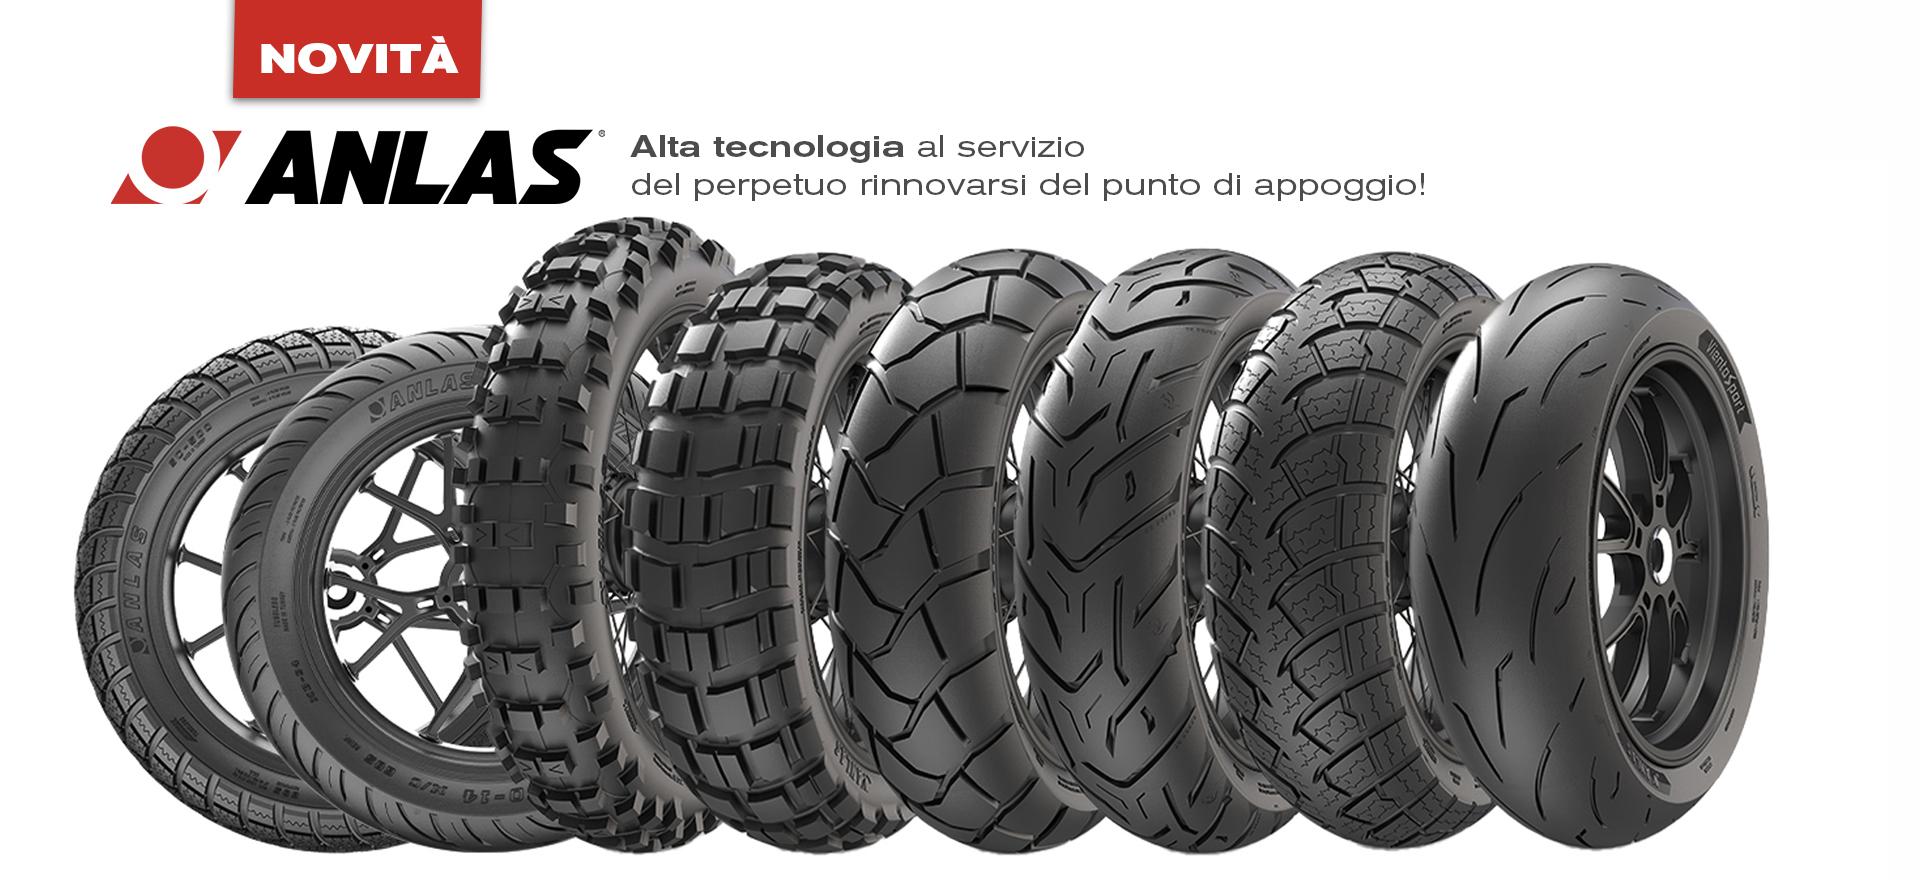 Bergamaschi nuovo distributore dei pneumatici Anlas